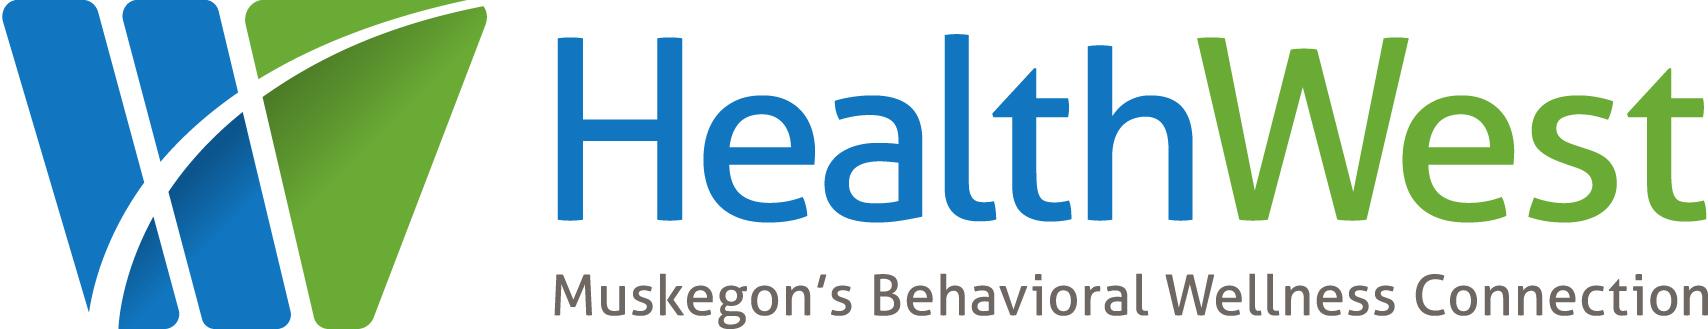 HealthWest-Logo-horiz-PMS-2.jpg